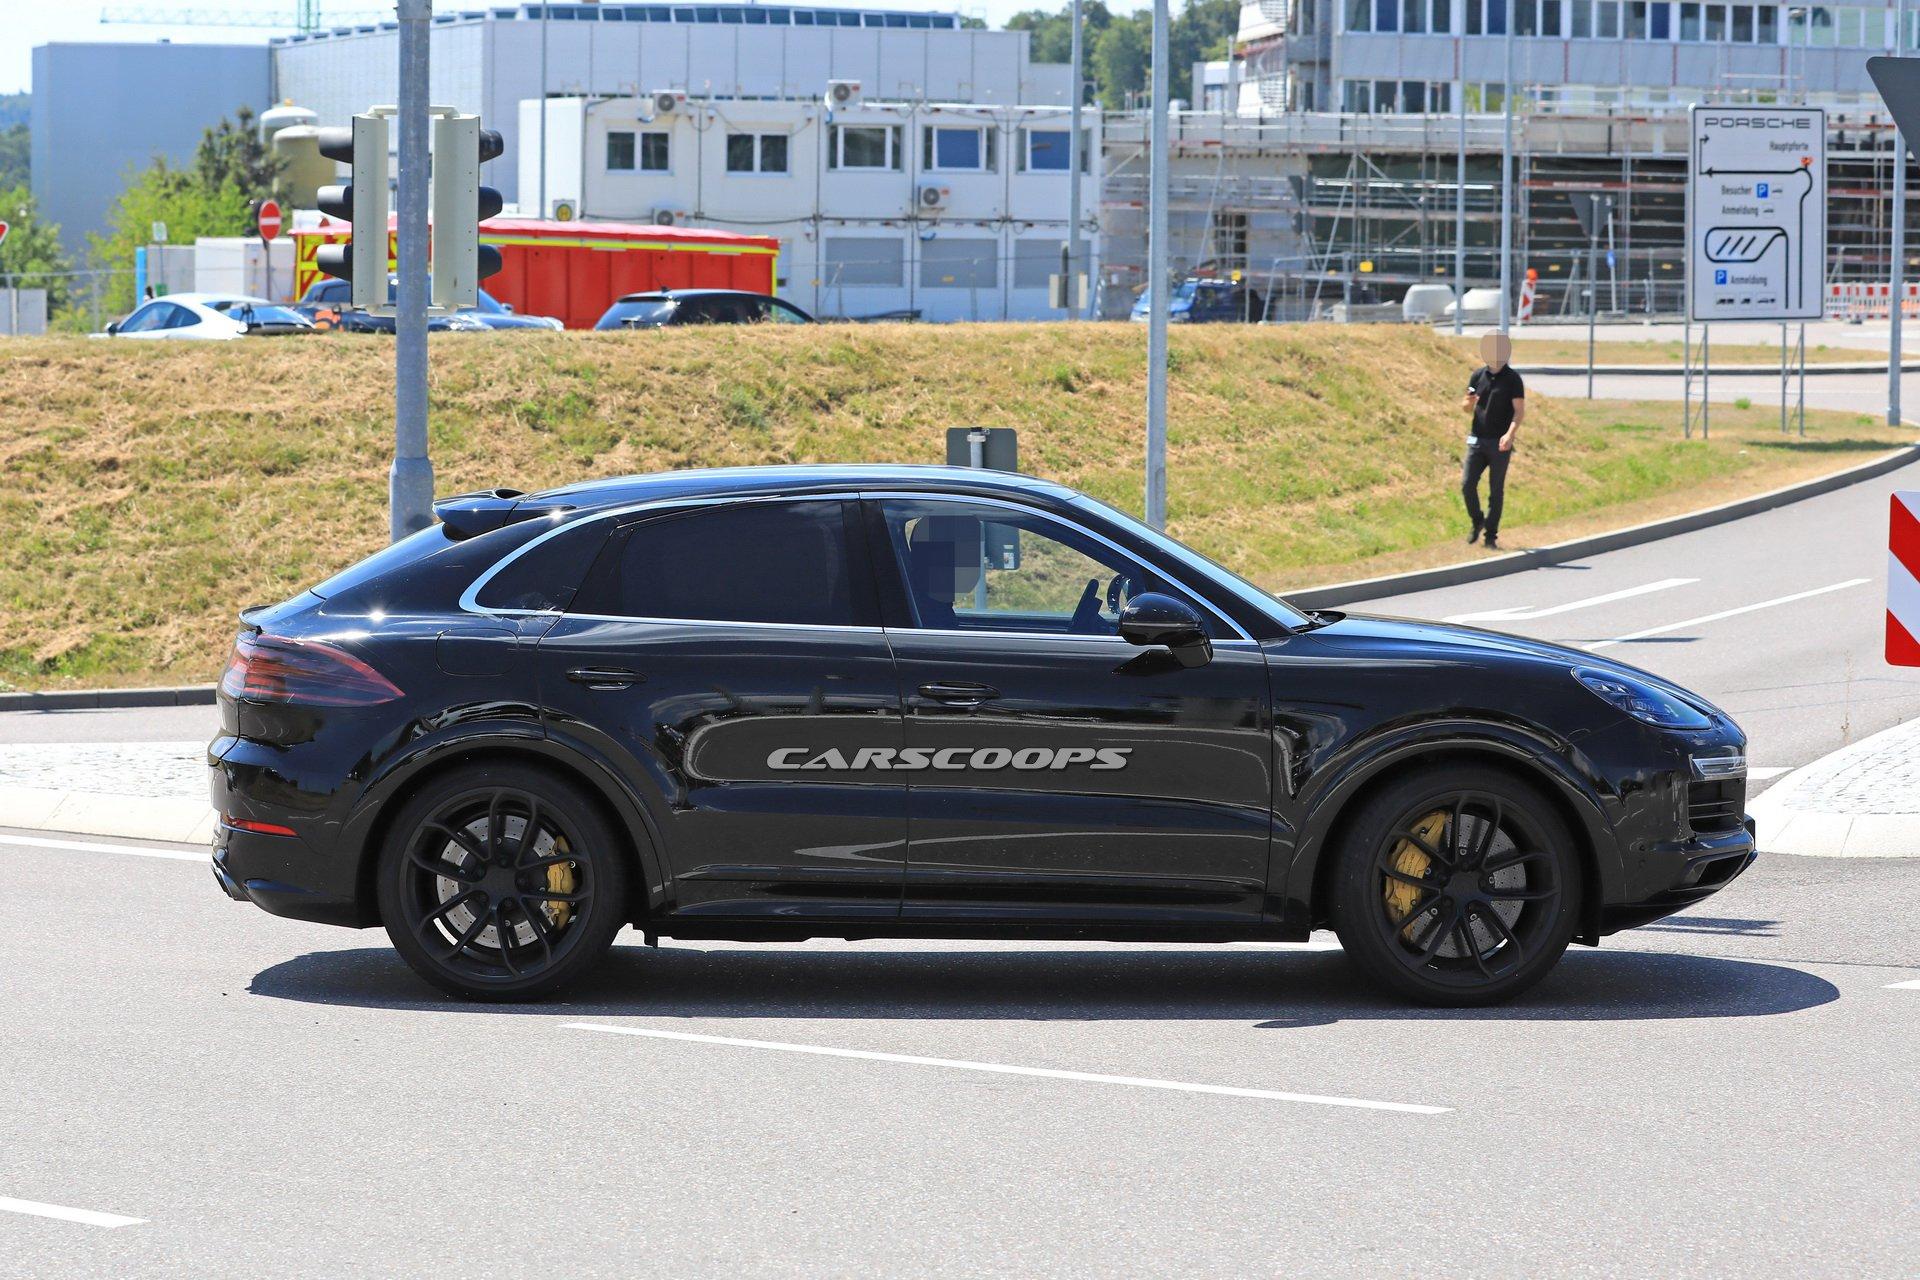 2b8eeb1e-porsche-cayenne-coupe-first-spy-13.jpg